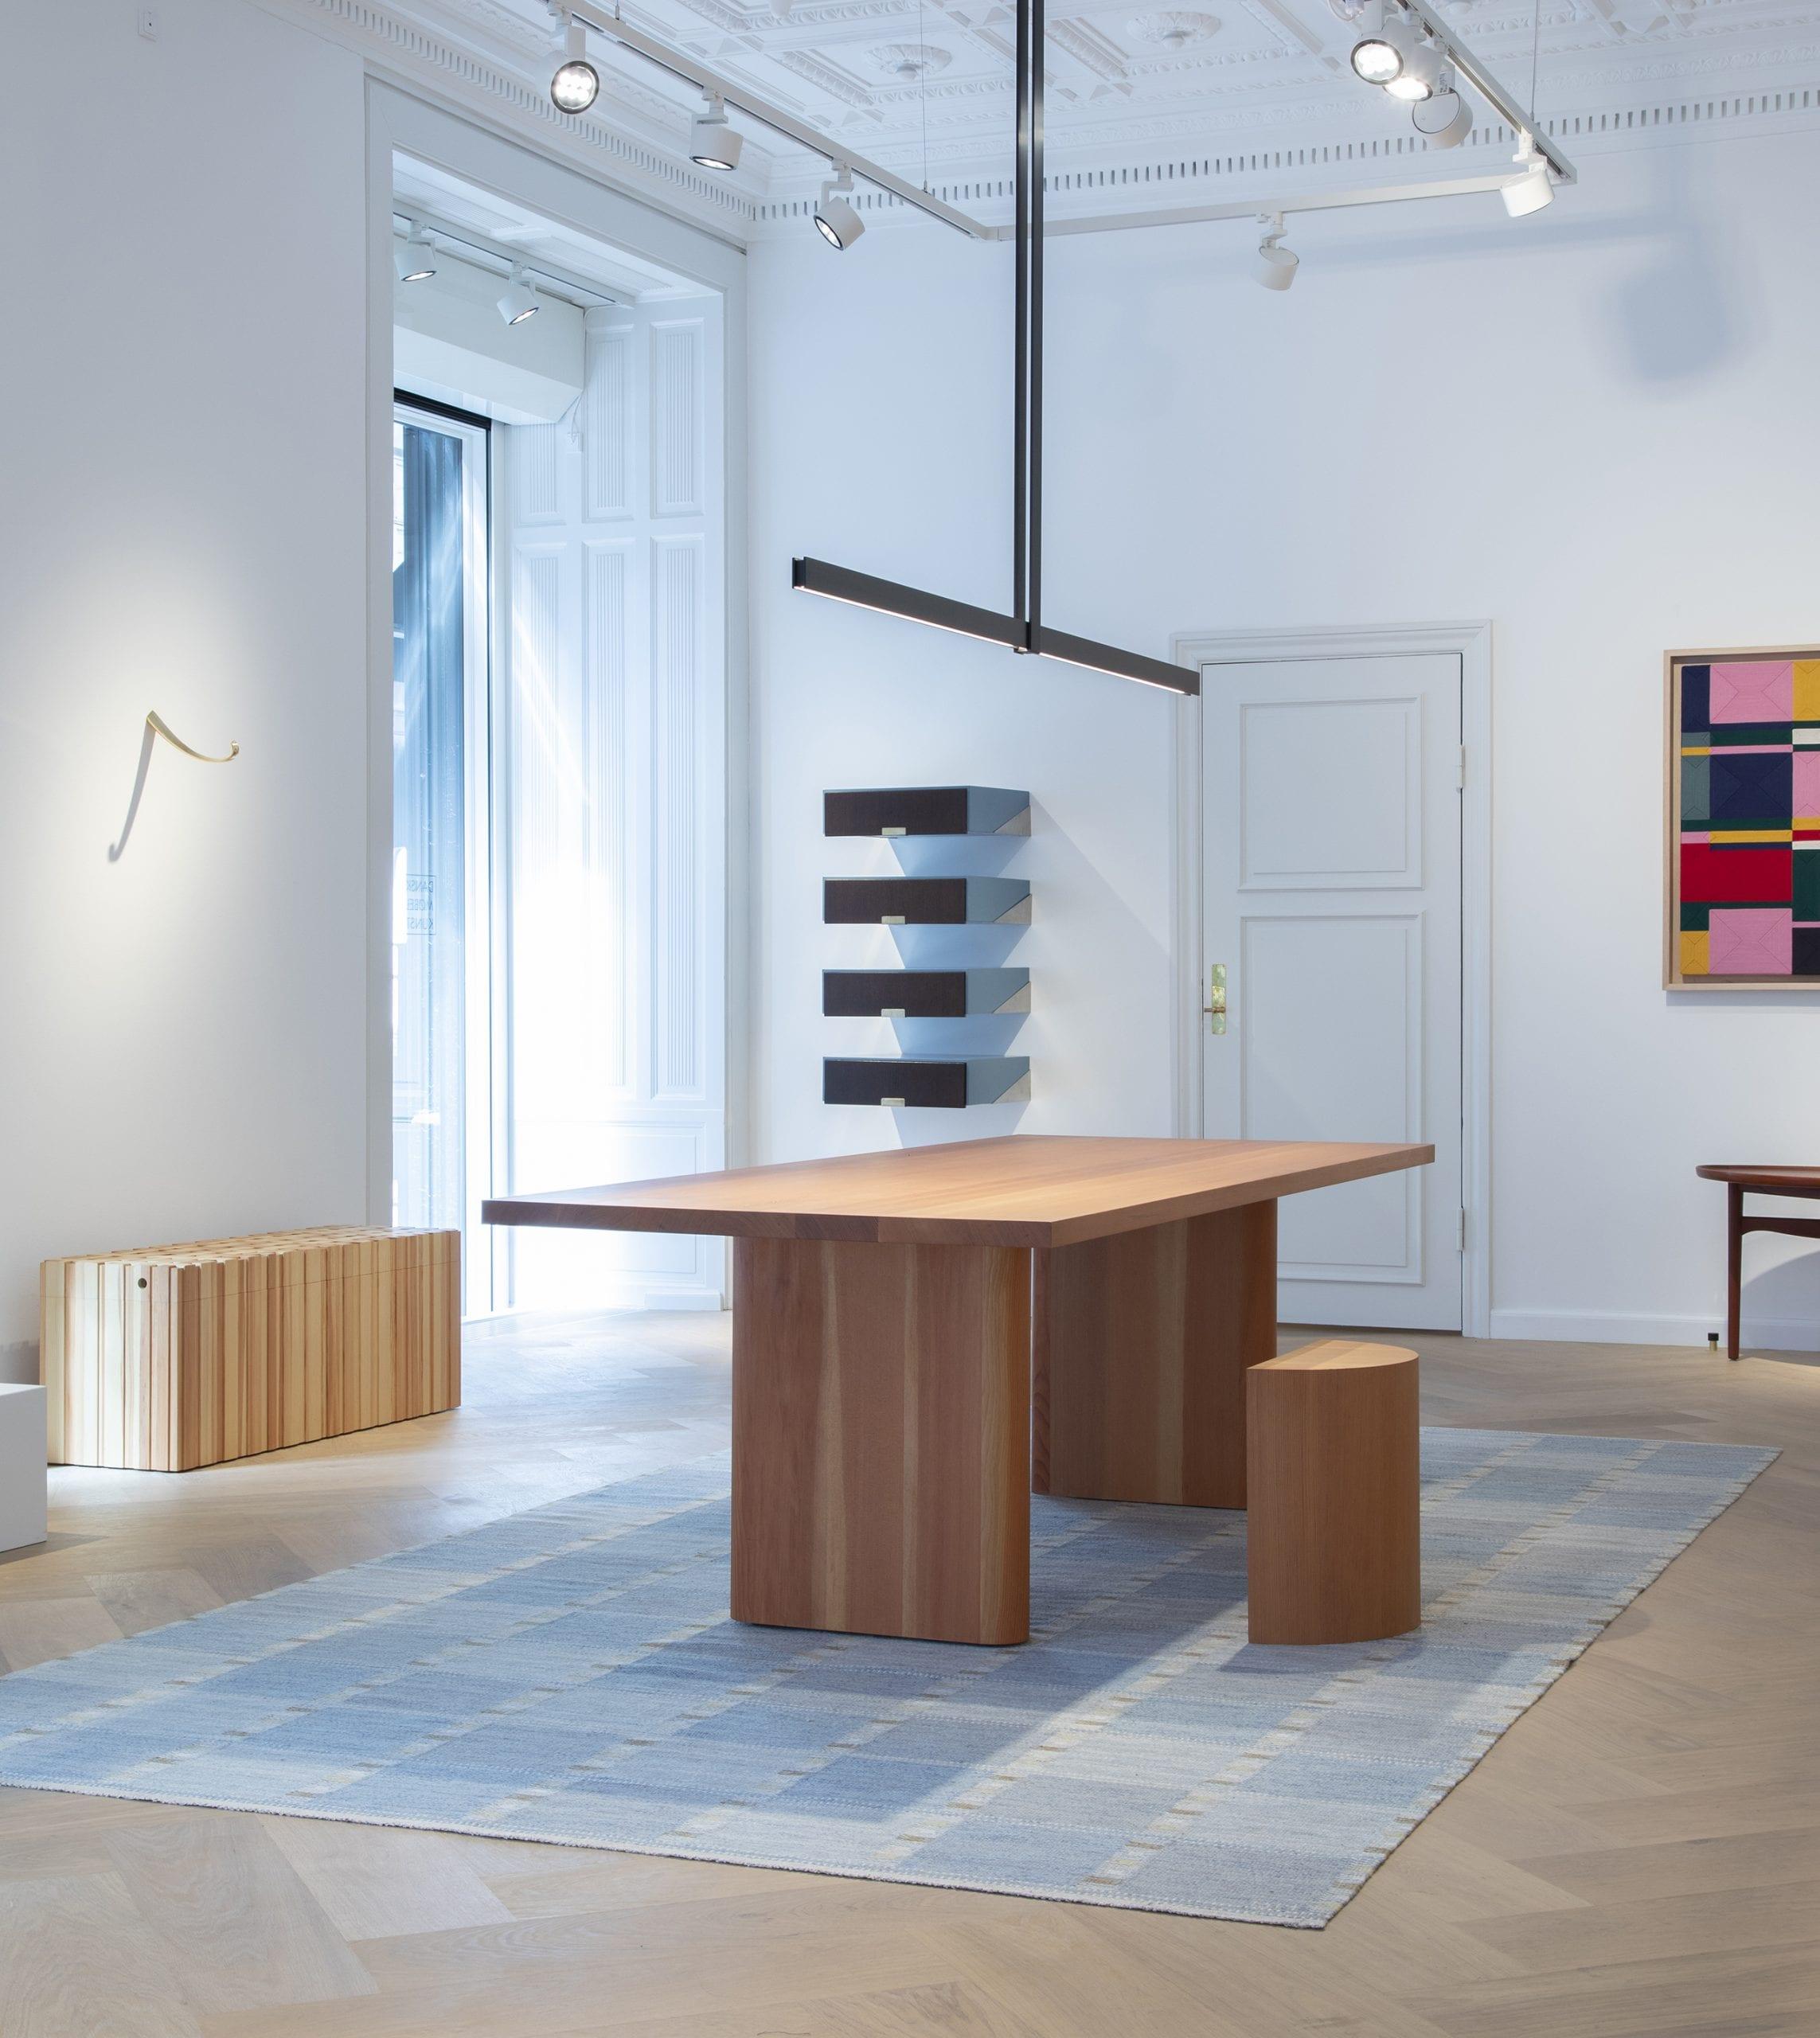 Copenhagen Gallery - Table and stool in Oregon Pine by Michael Anastassiades for Dansk Møbelkunst